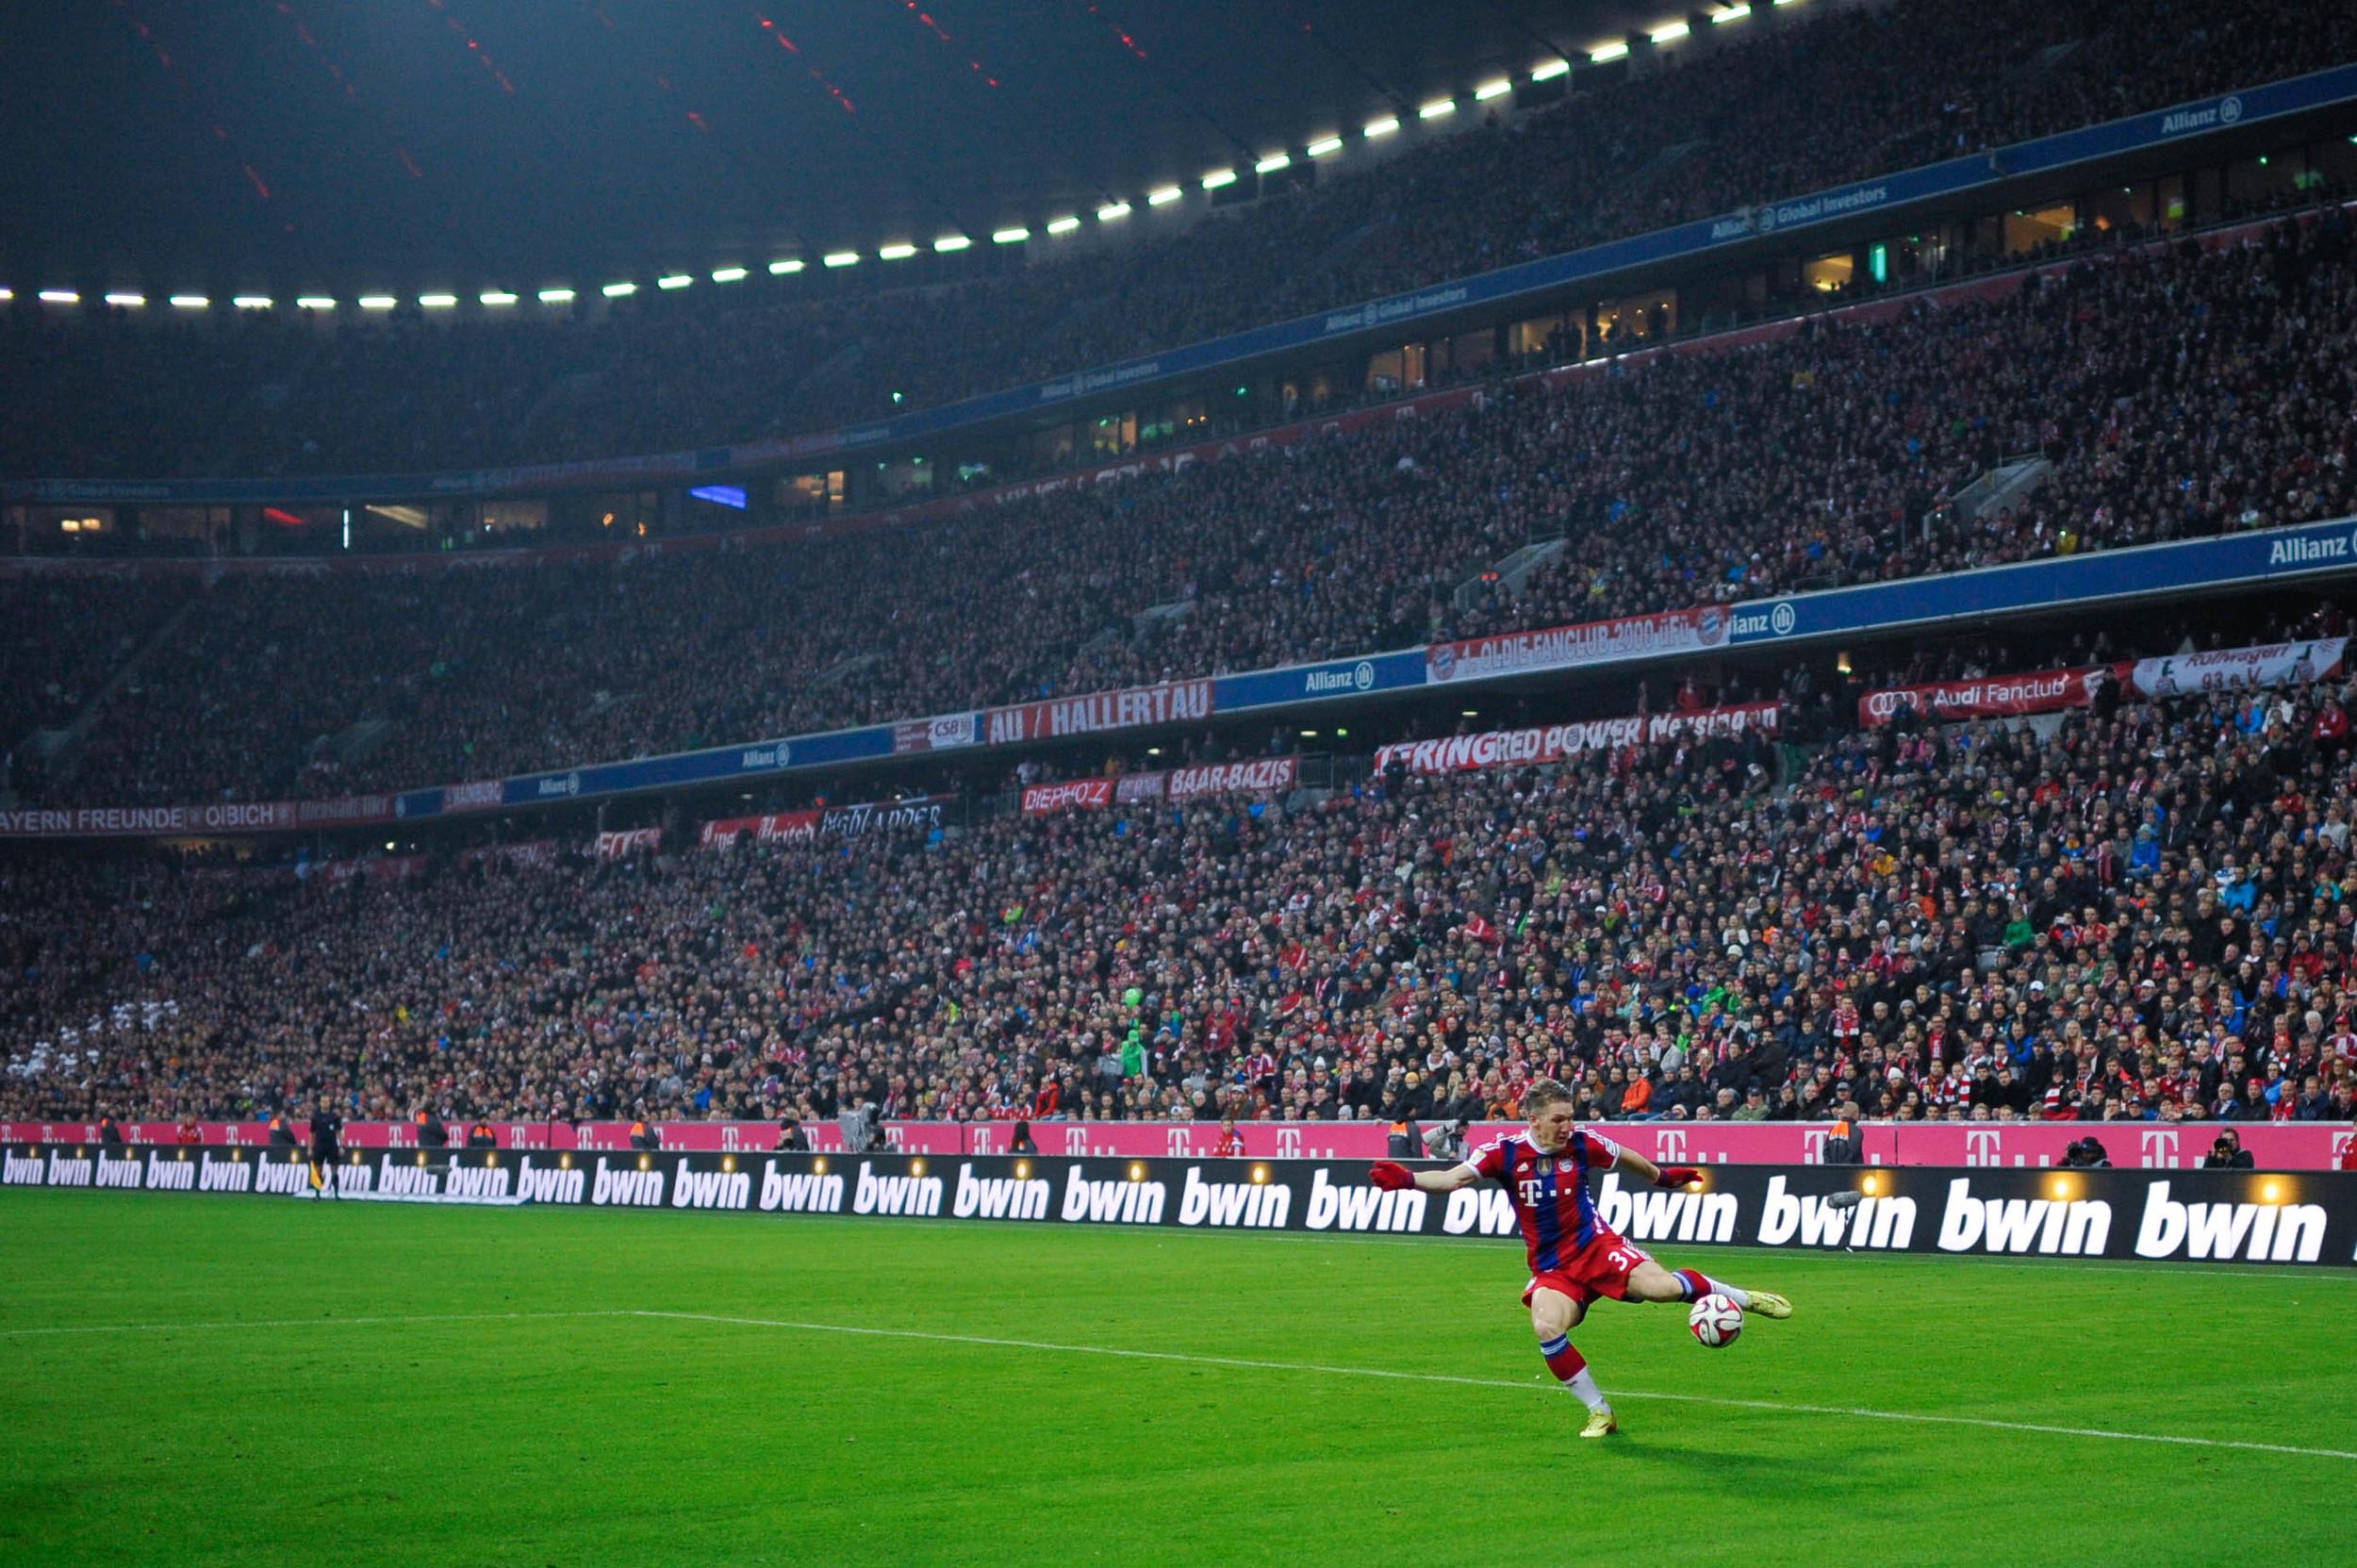 Stadion_FCB_vs_TSGH_22.11.2014_web-35.jpg